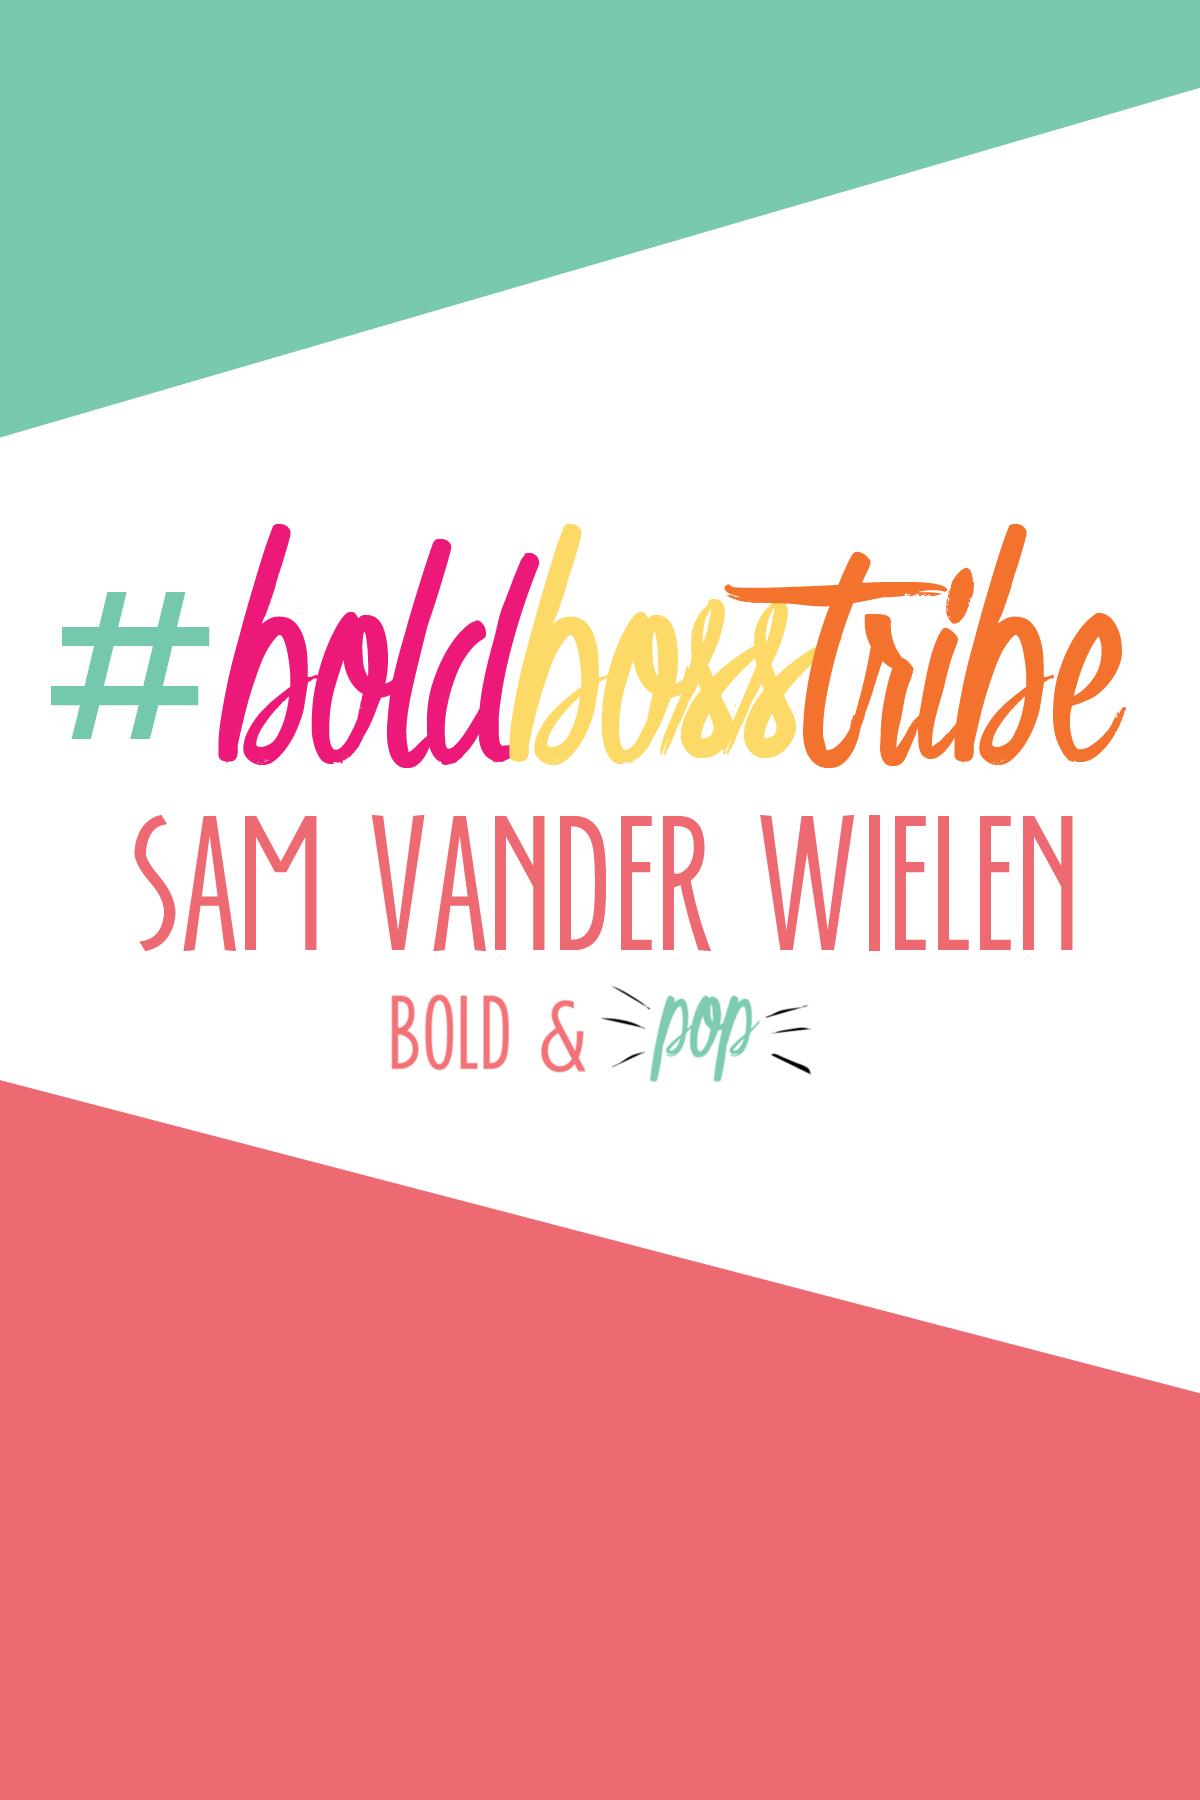 Bold & Pop : #BoldBossTribe Feature with Sam Vander Wielen